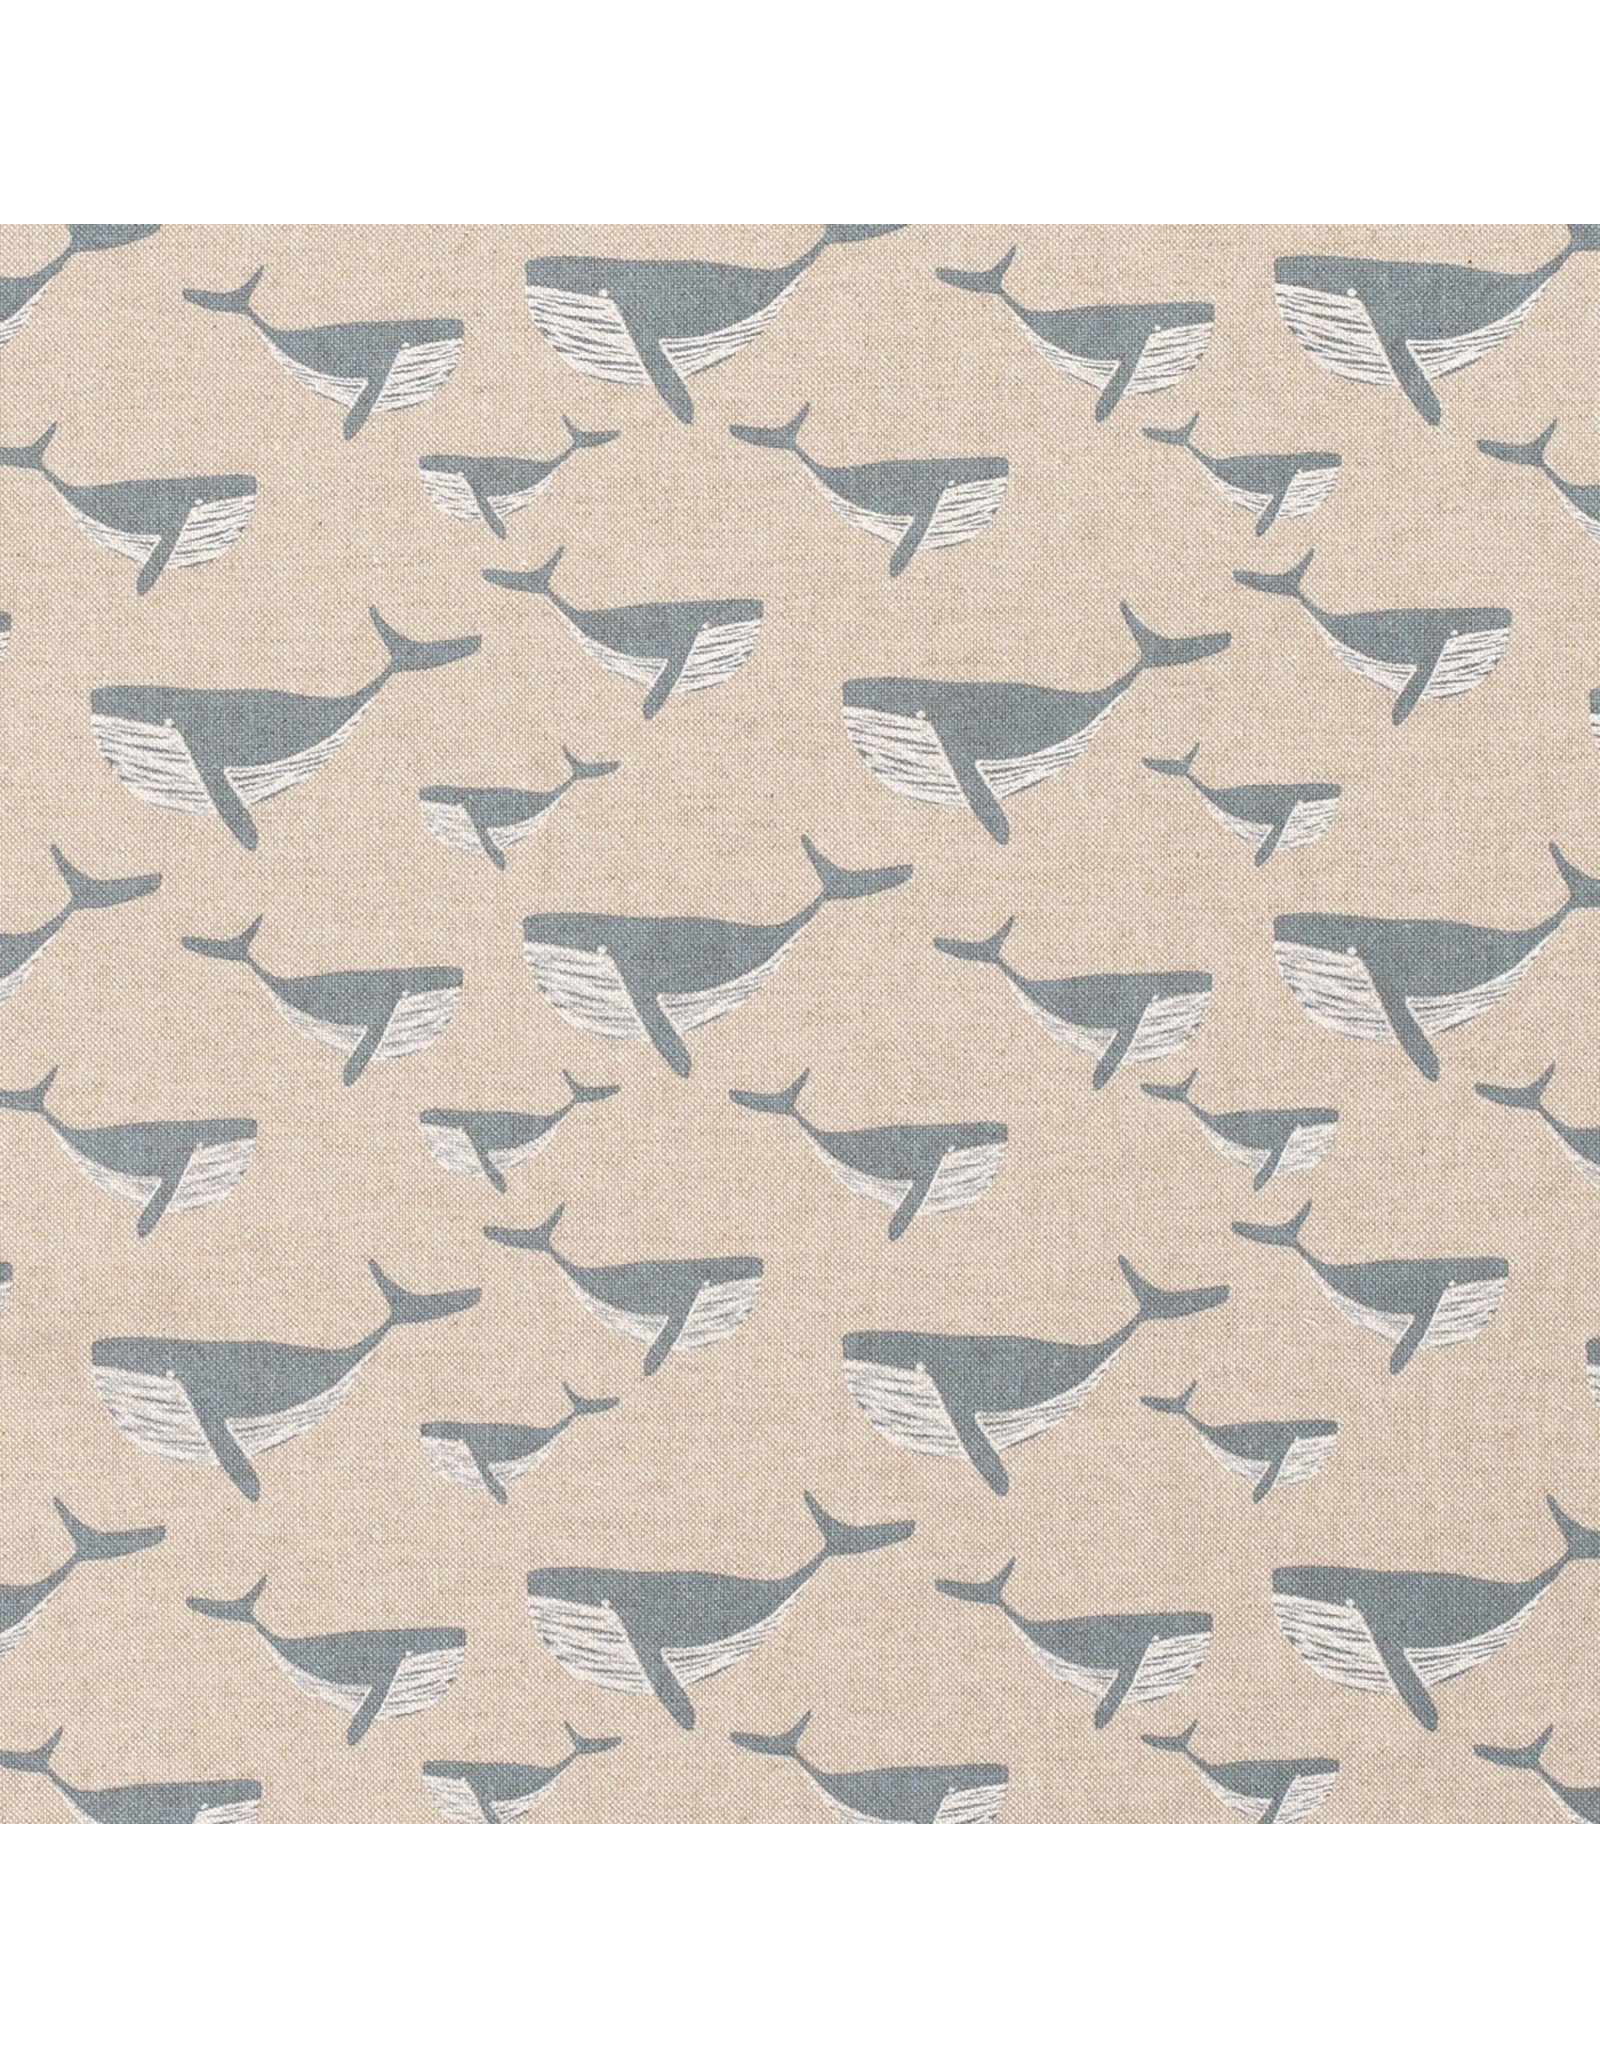 Linnenlook premium Sharks